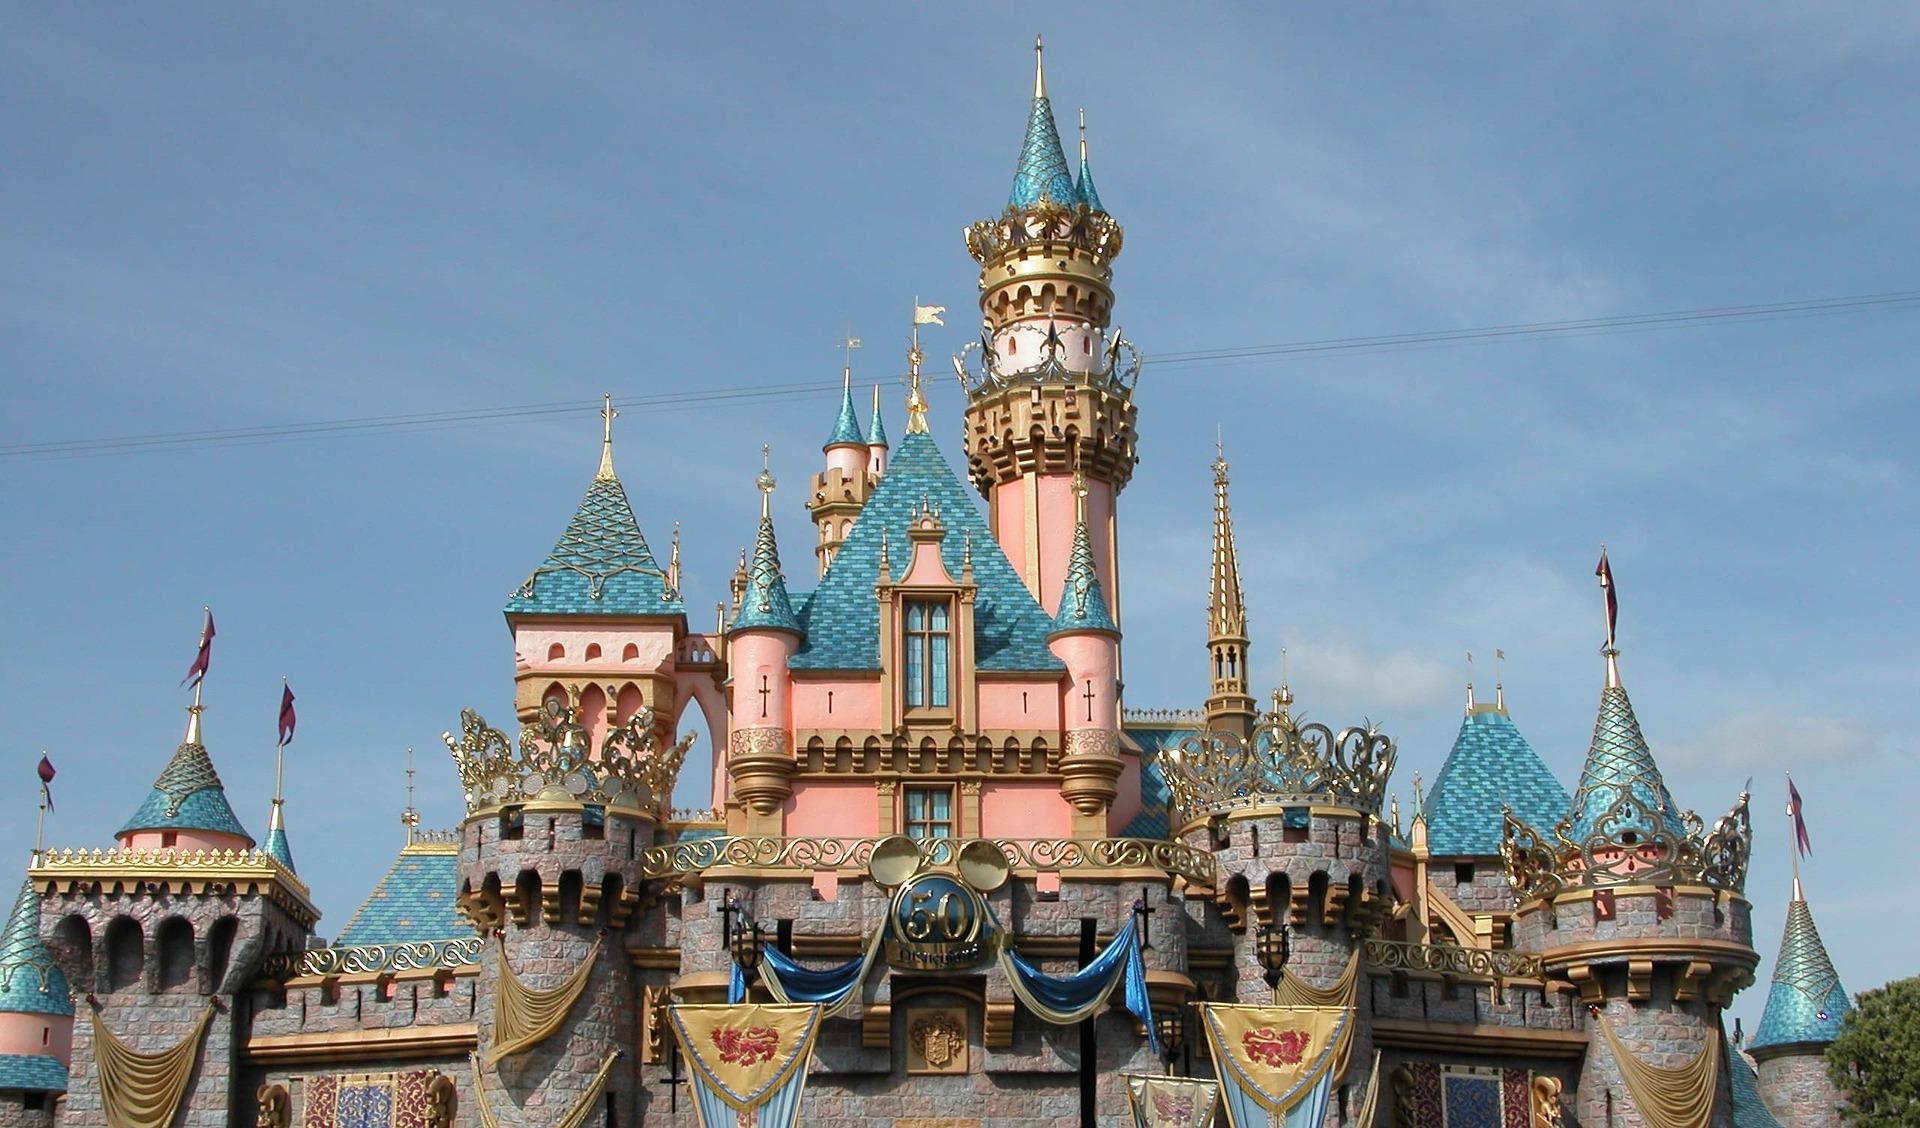 castle-of-the-sleeping-beauty-1173955_1920